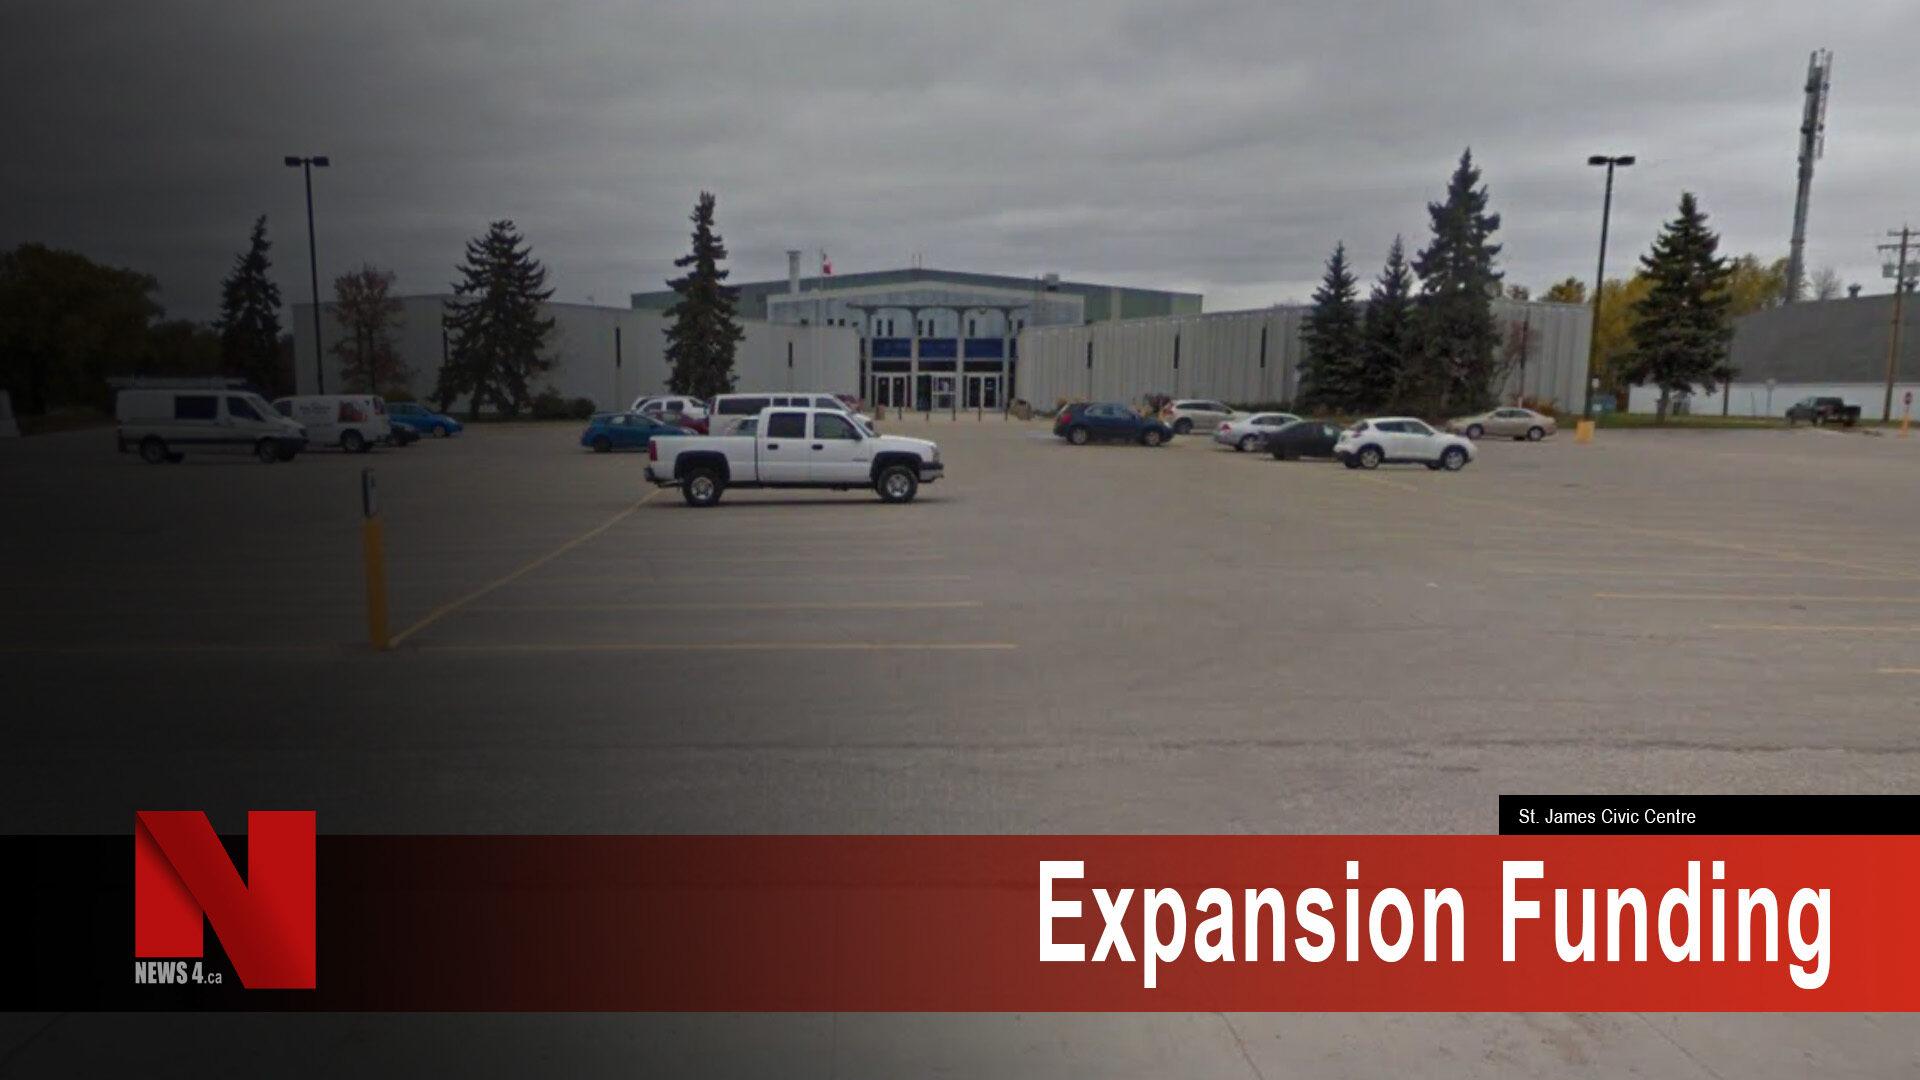 expansion Funding